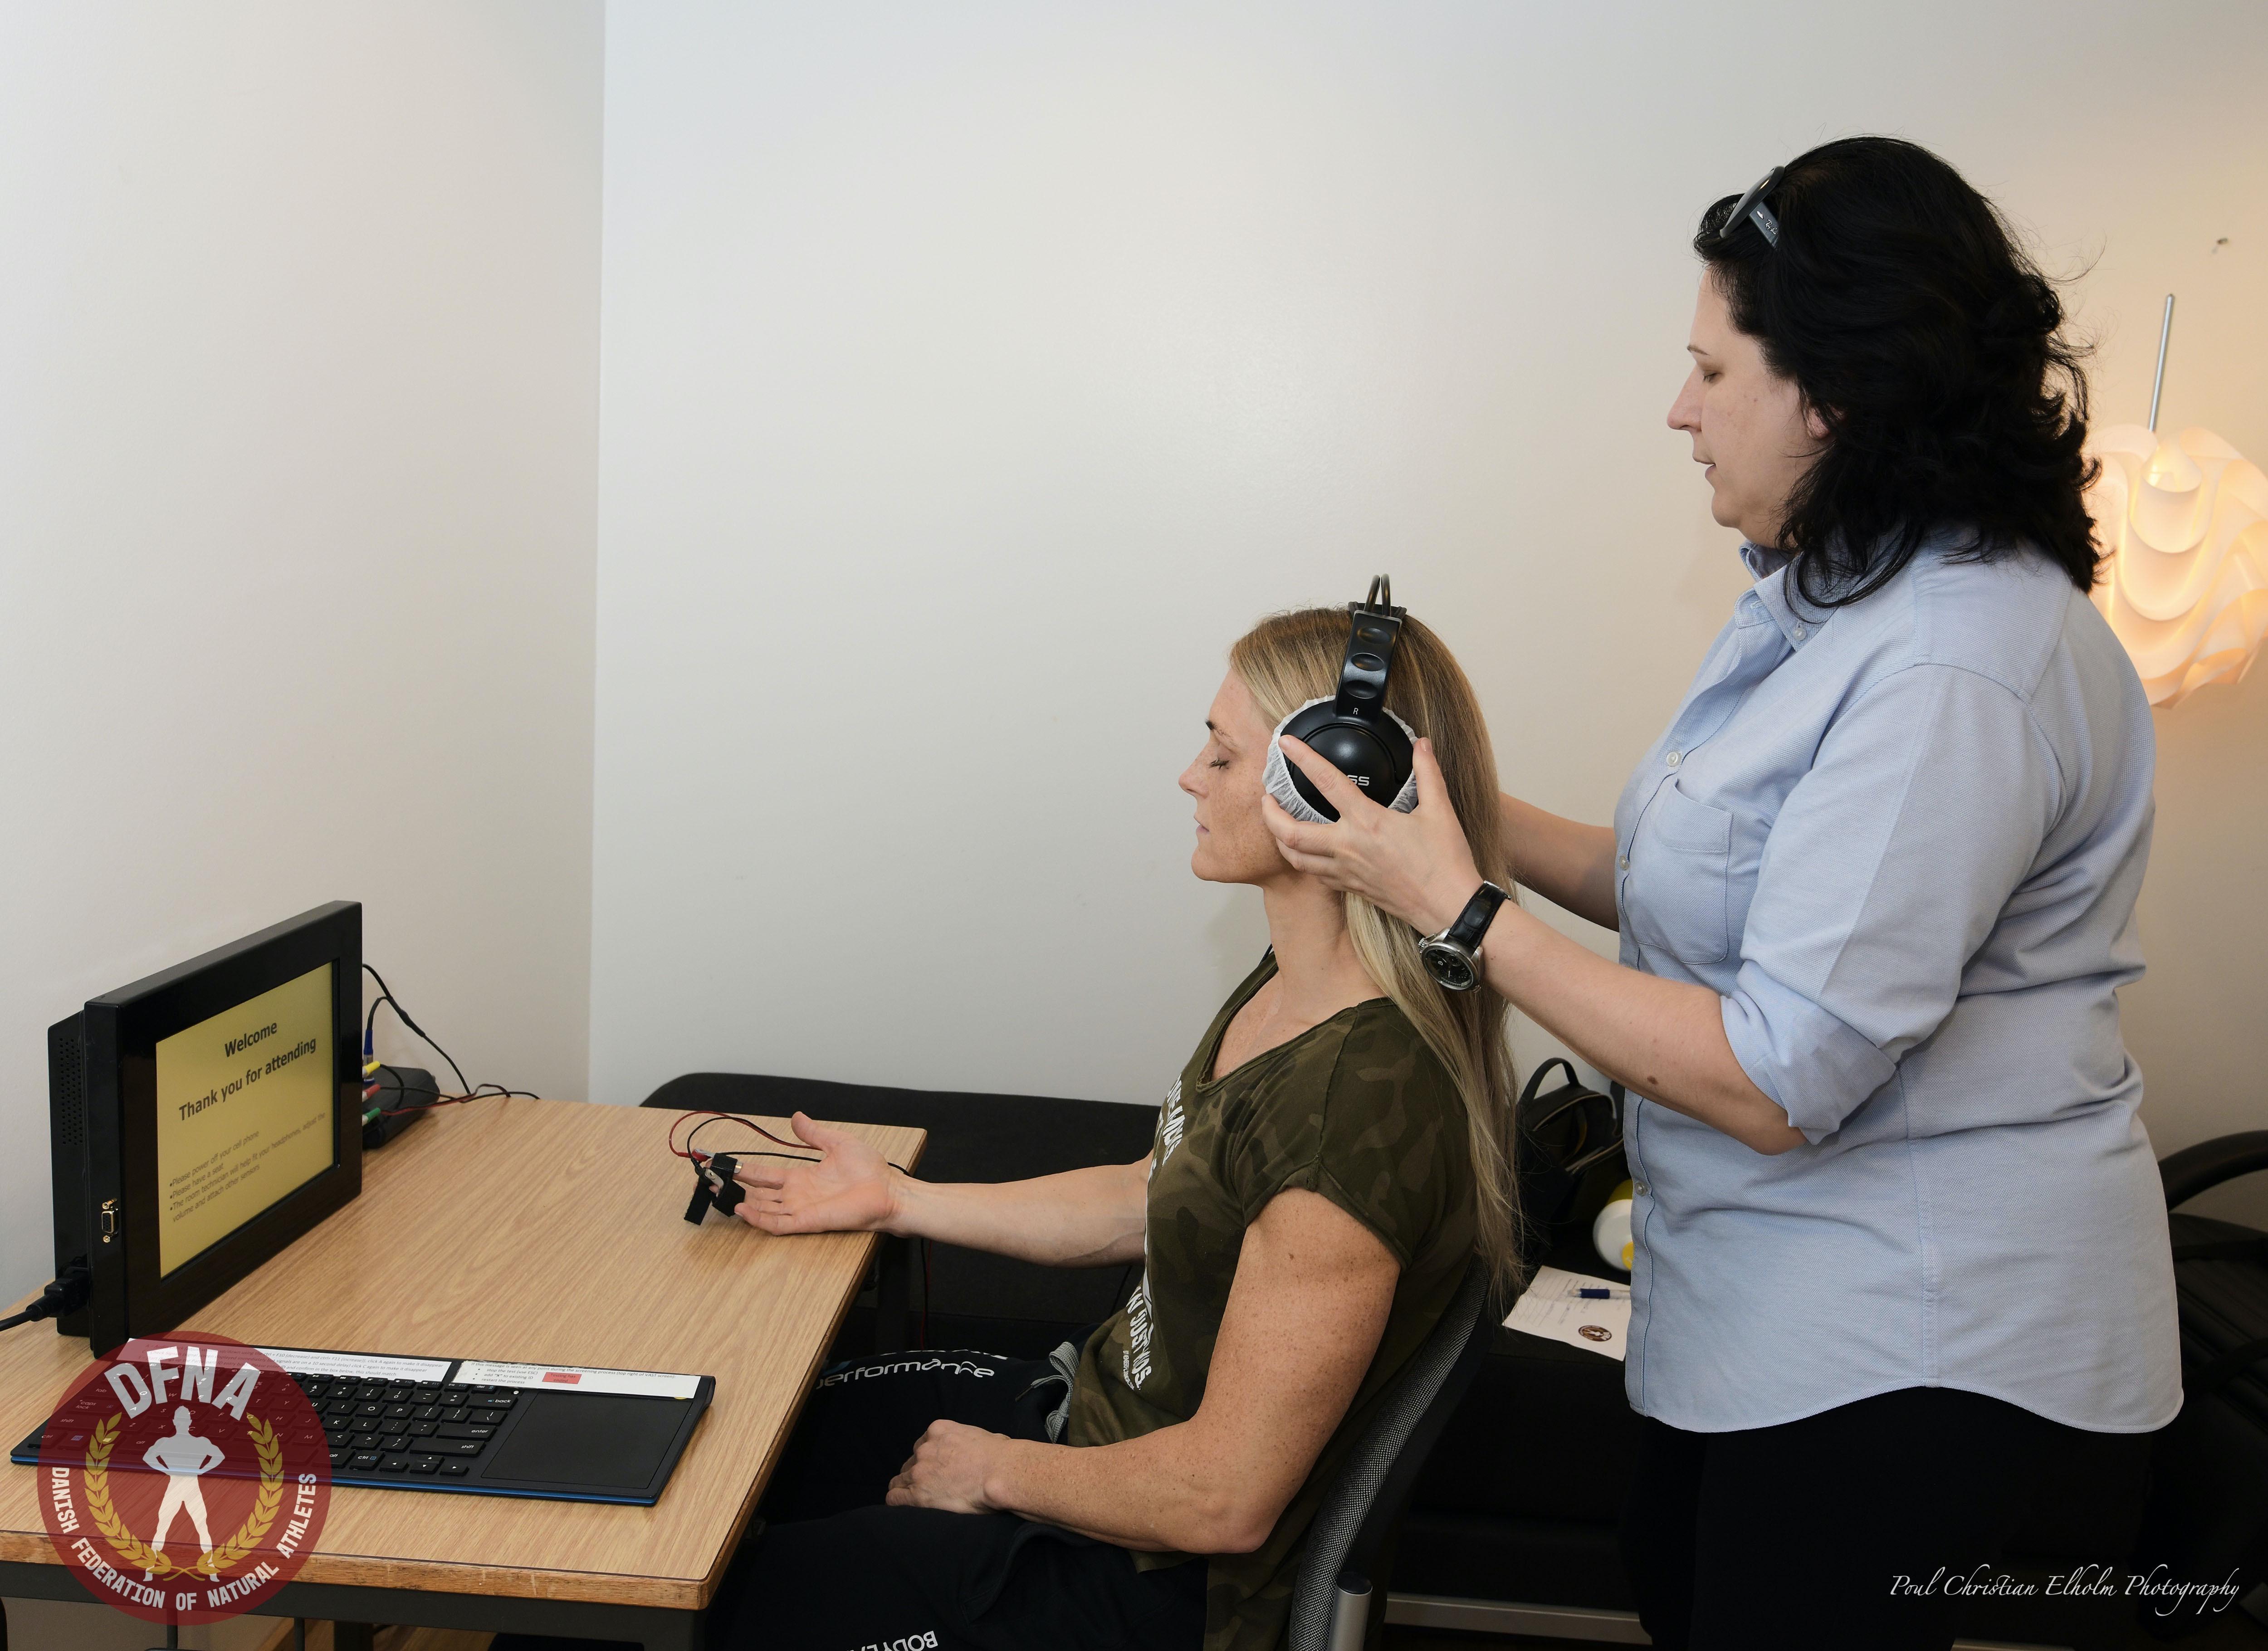 Polygraph test